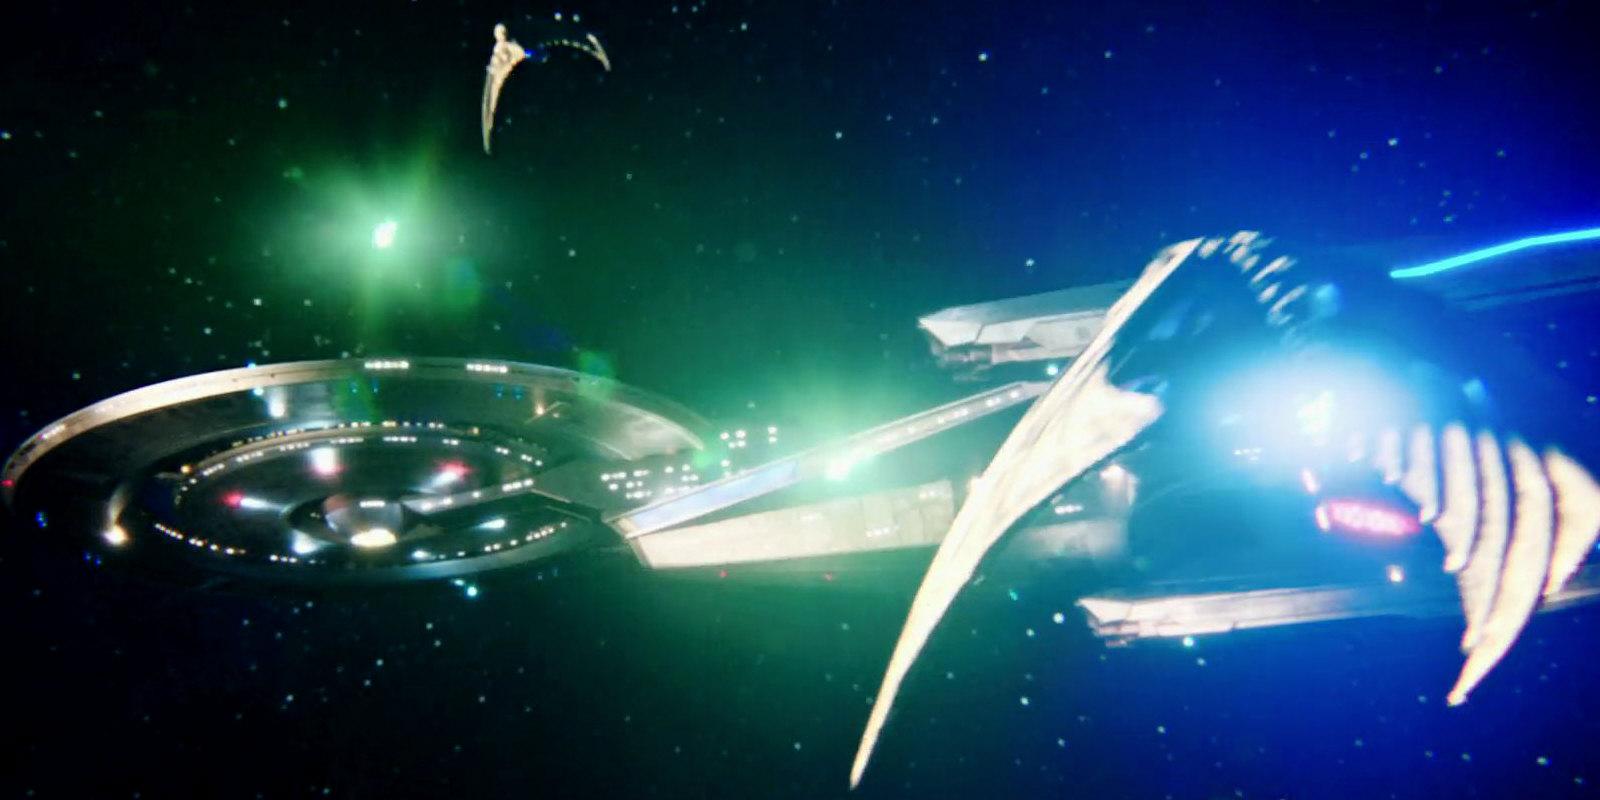 Klingon Bird Of Prey Tos Ex Astris Scient...